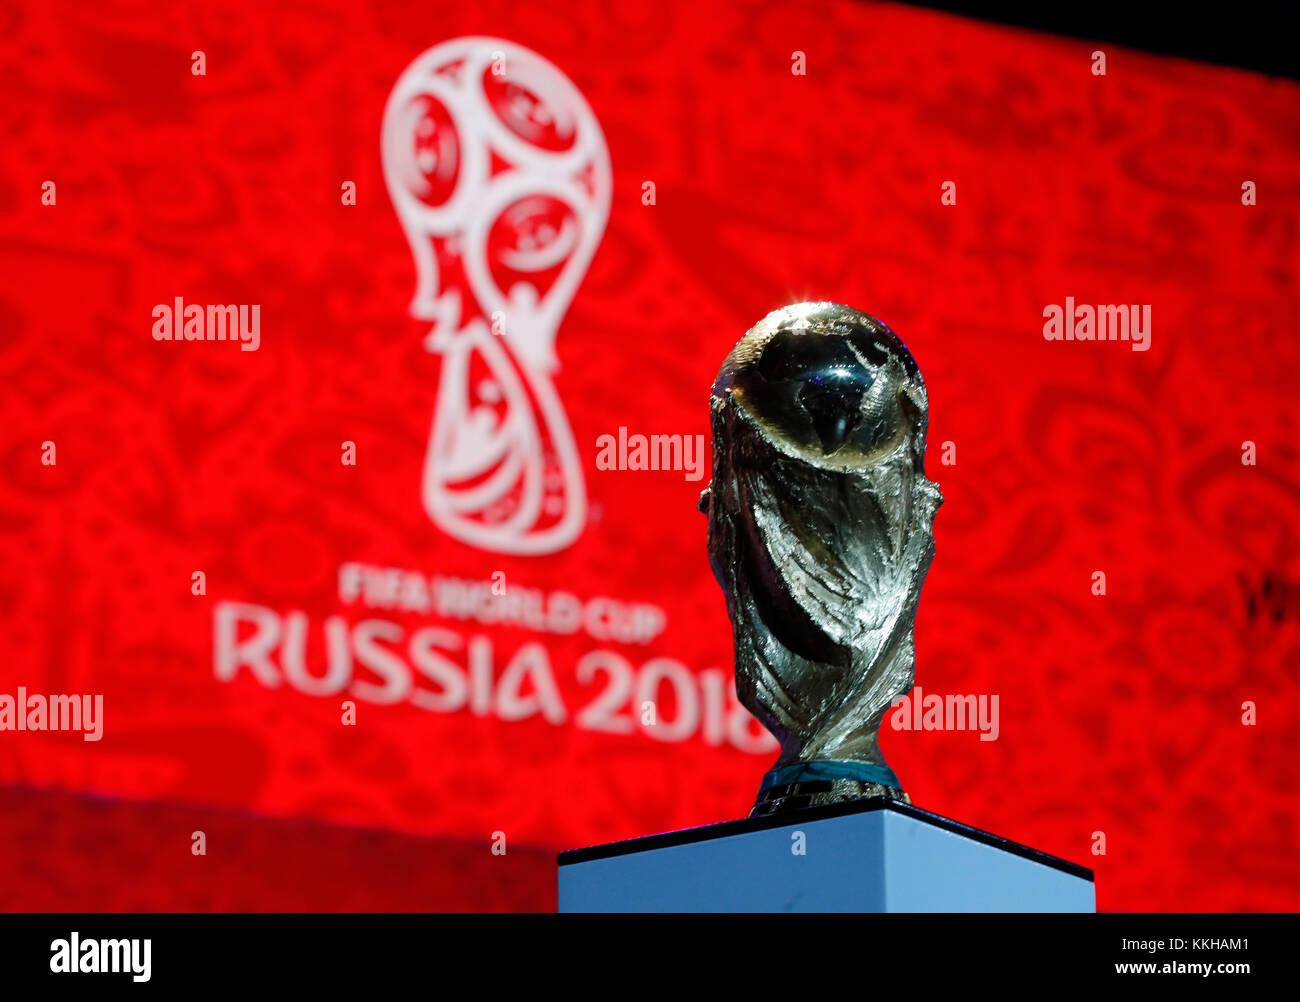 Moskau, Russland. 29th Nov, 2017. Der FIFA- Weltpokal/Trophaee, Trophy vor dem Logo der WM 2018. Fussball: Auslosung zur FIFA- Fussball Weltmeisterschaft 2018 in Moskau, Russland 01.12.2017 - Football, Draw for the FIFA- World Cup 2018, Moscow, December 01, 2017  usage worldwide Credit: dpa/Alamy Live News Stock Photo